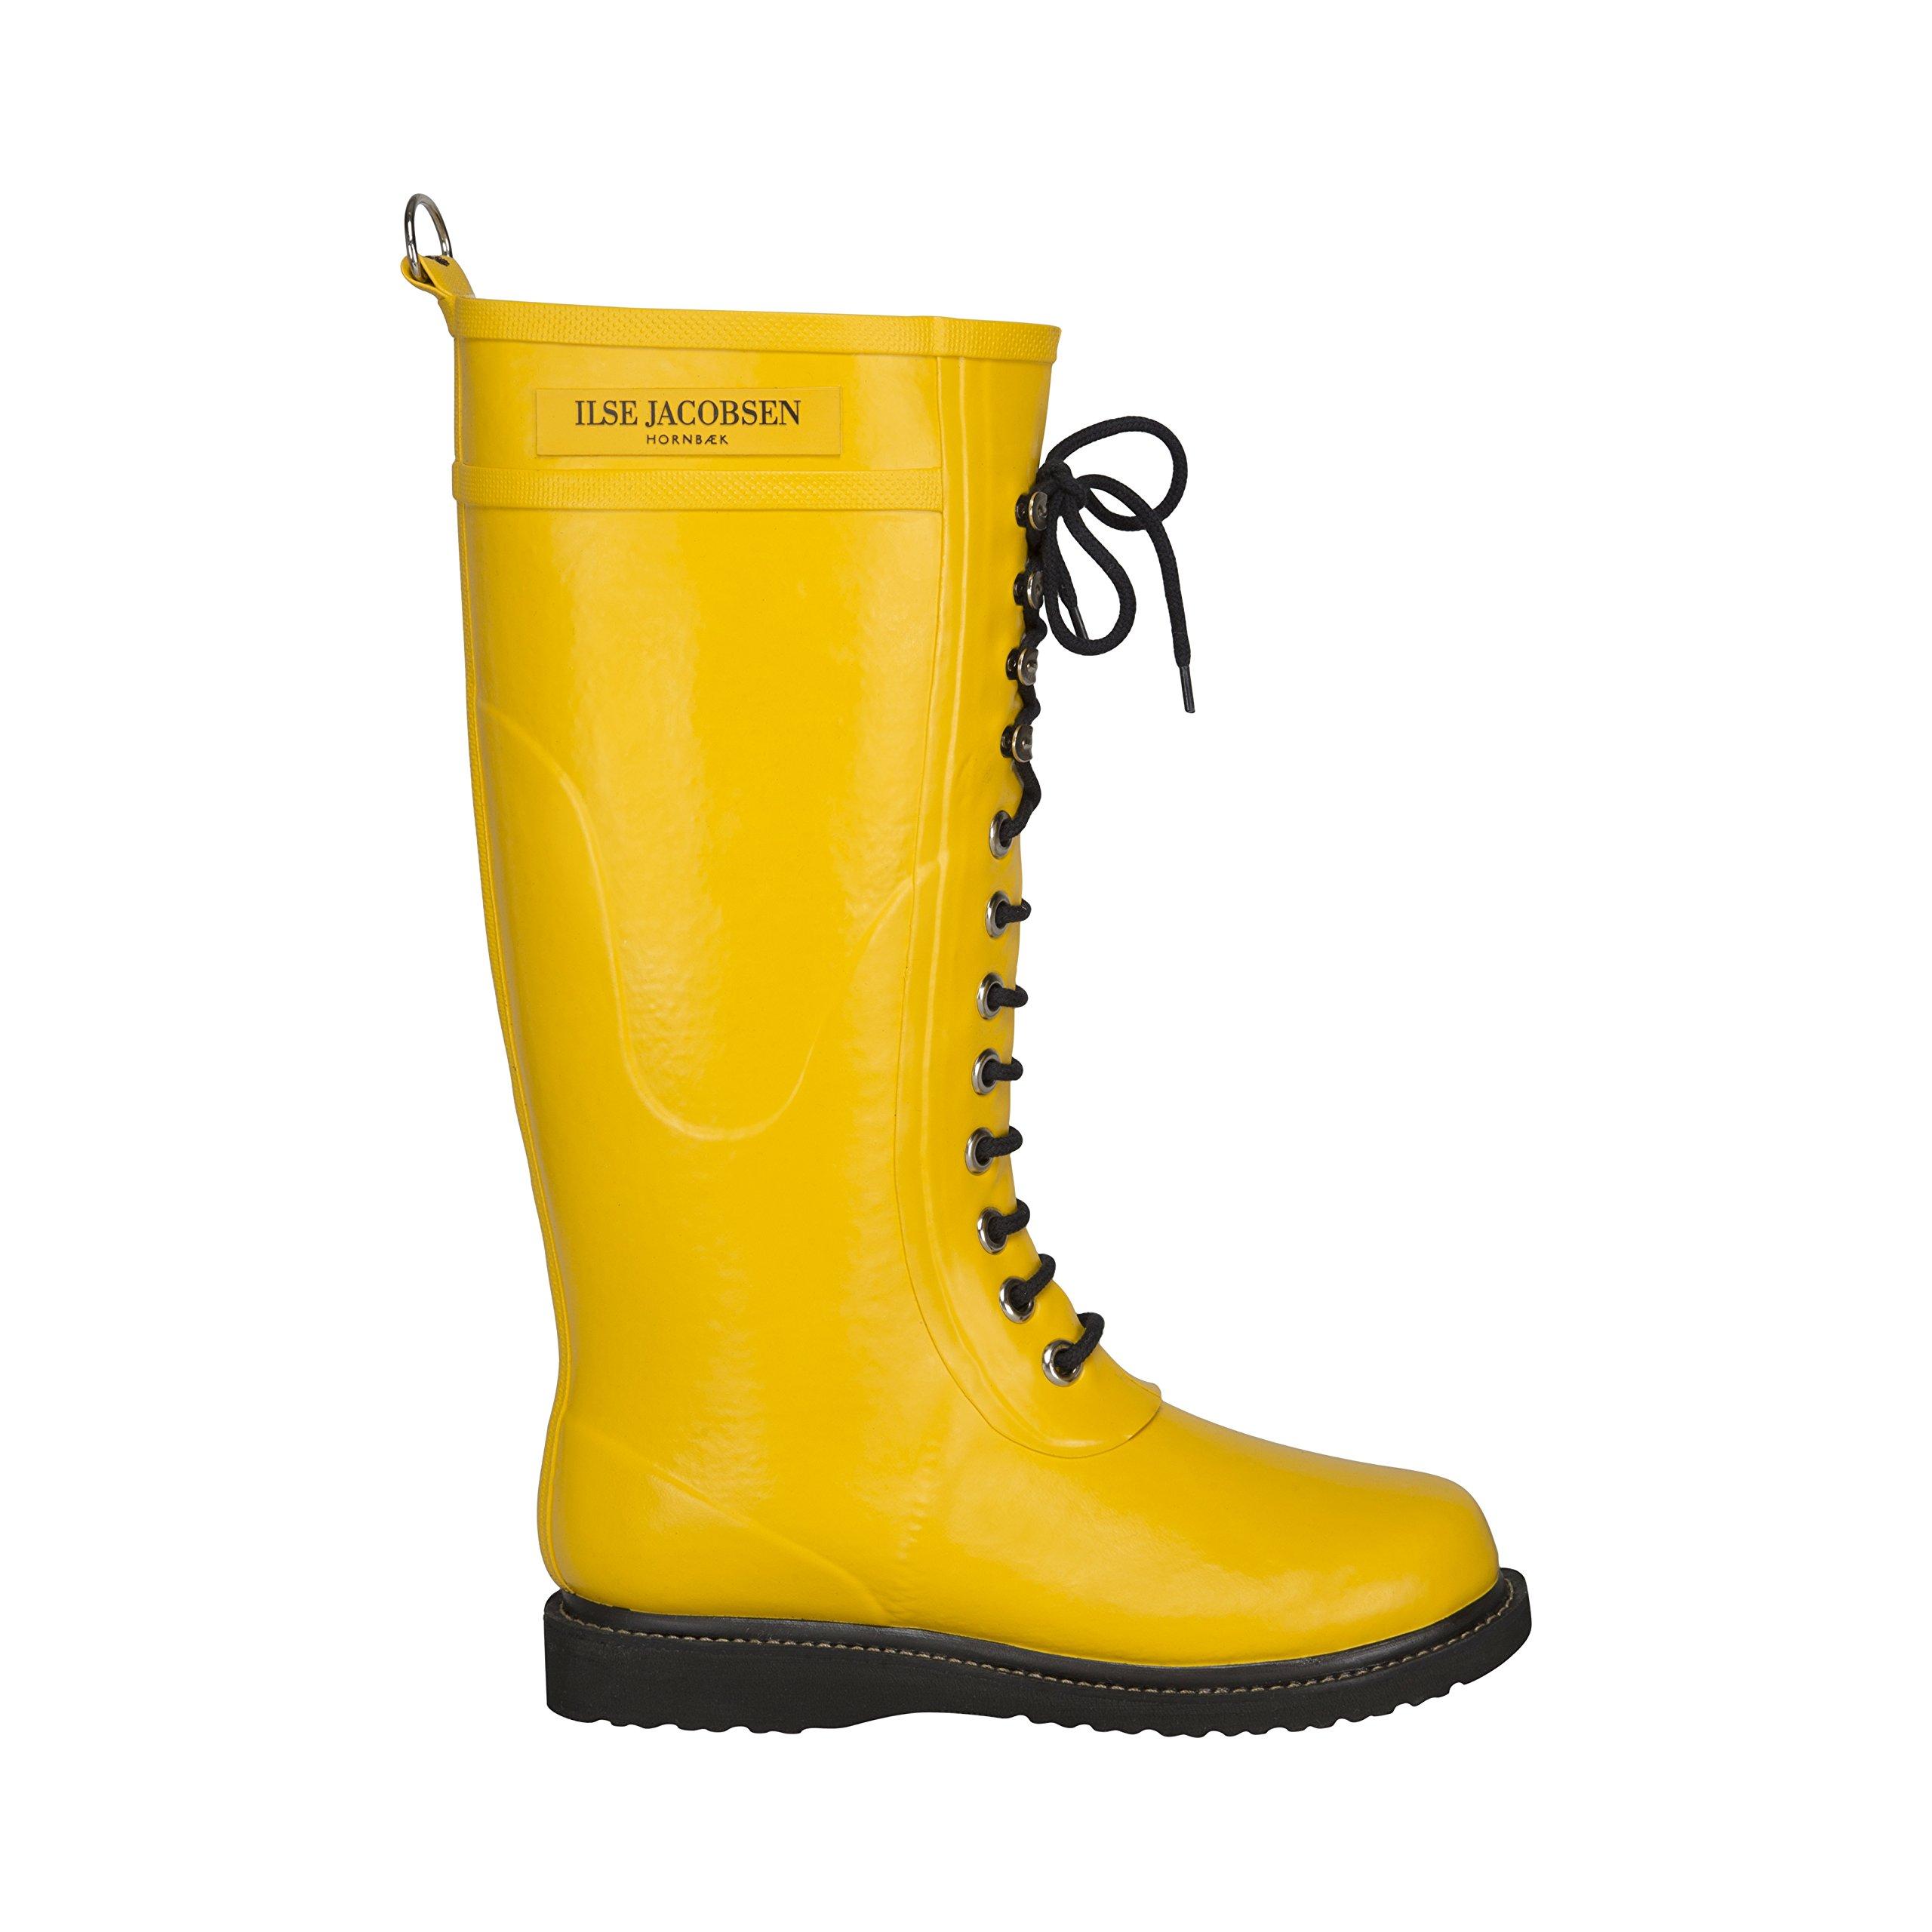 ILSE JACOBSEN Rub1 Boot - Women's Cyber Yellow 38